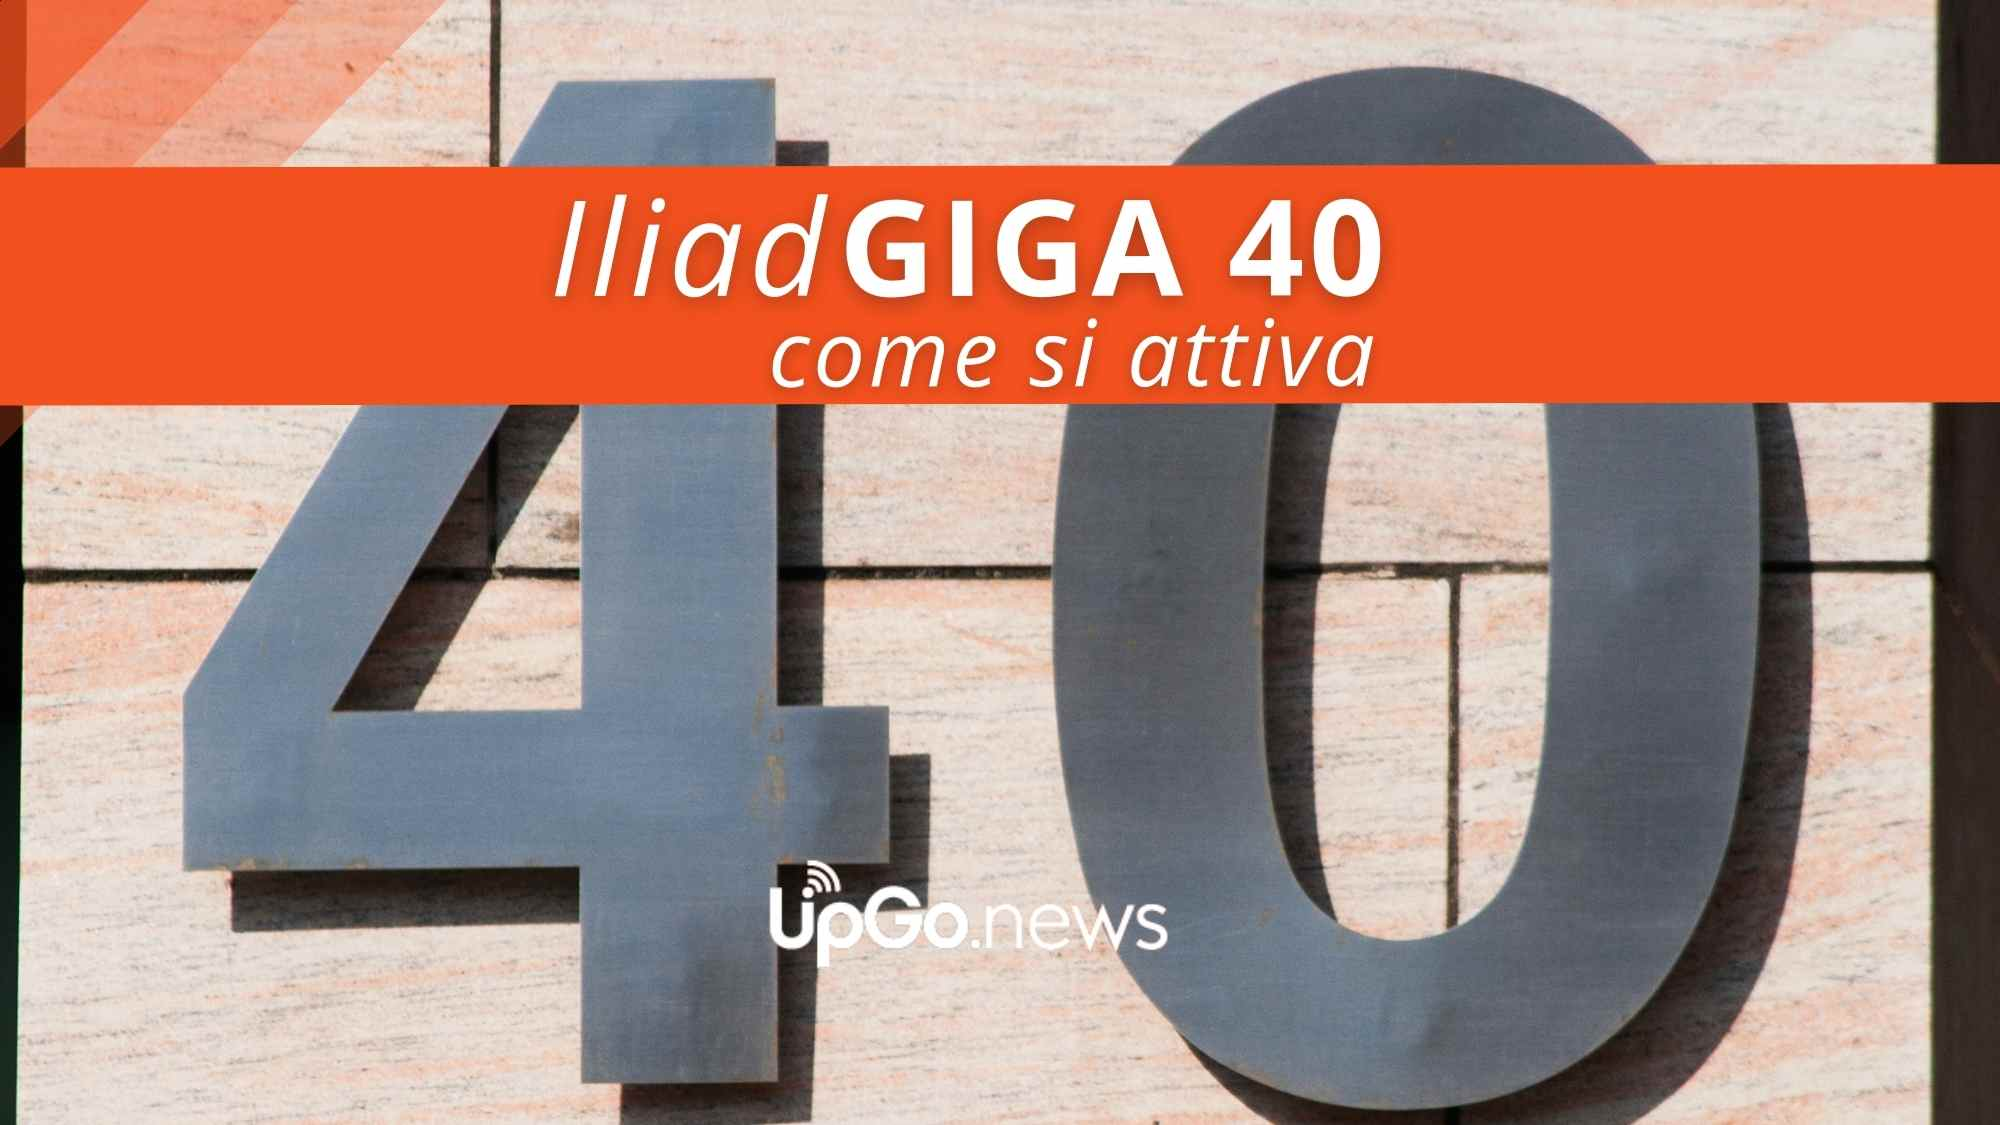 Iliad Giga 40 a 6,99 euro al mese